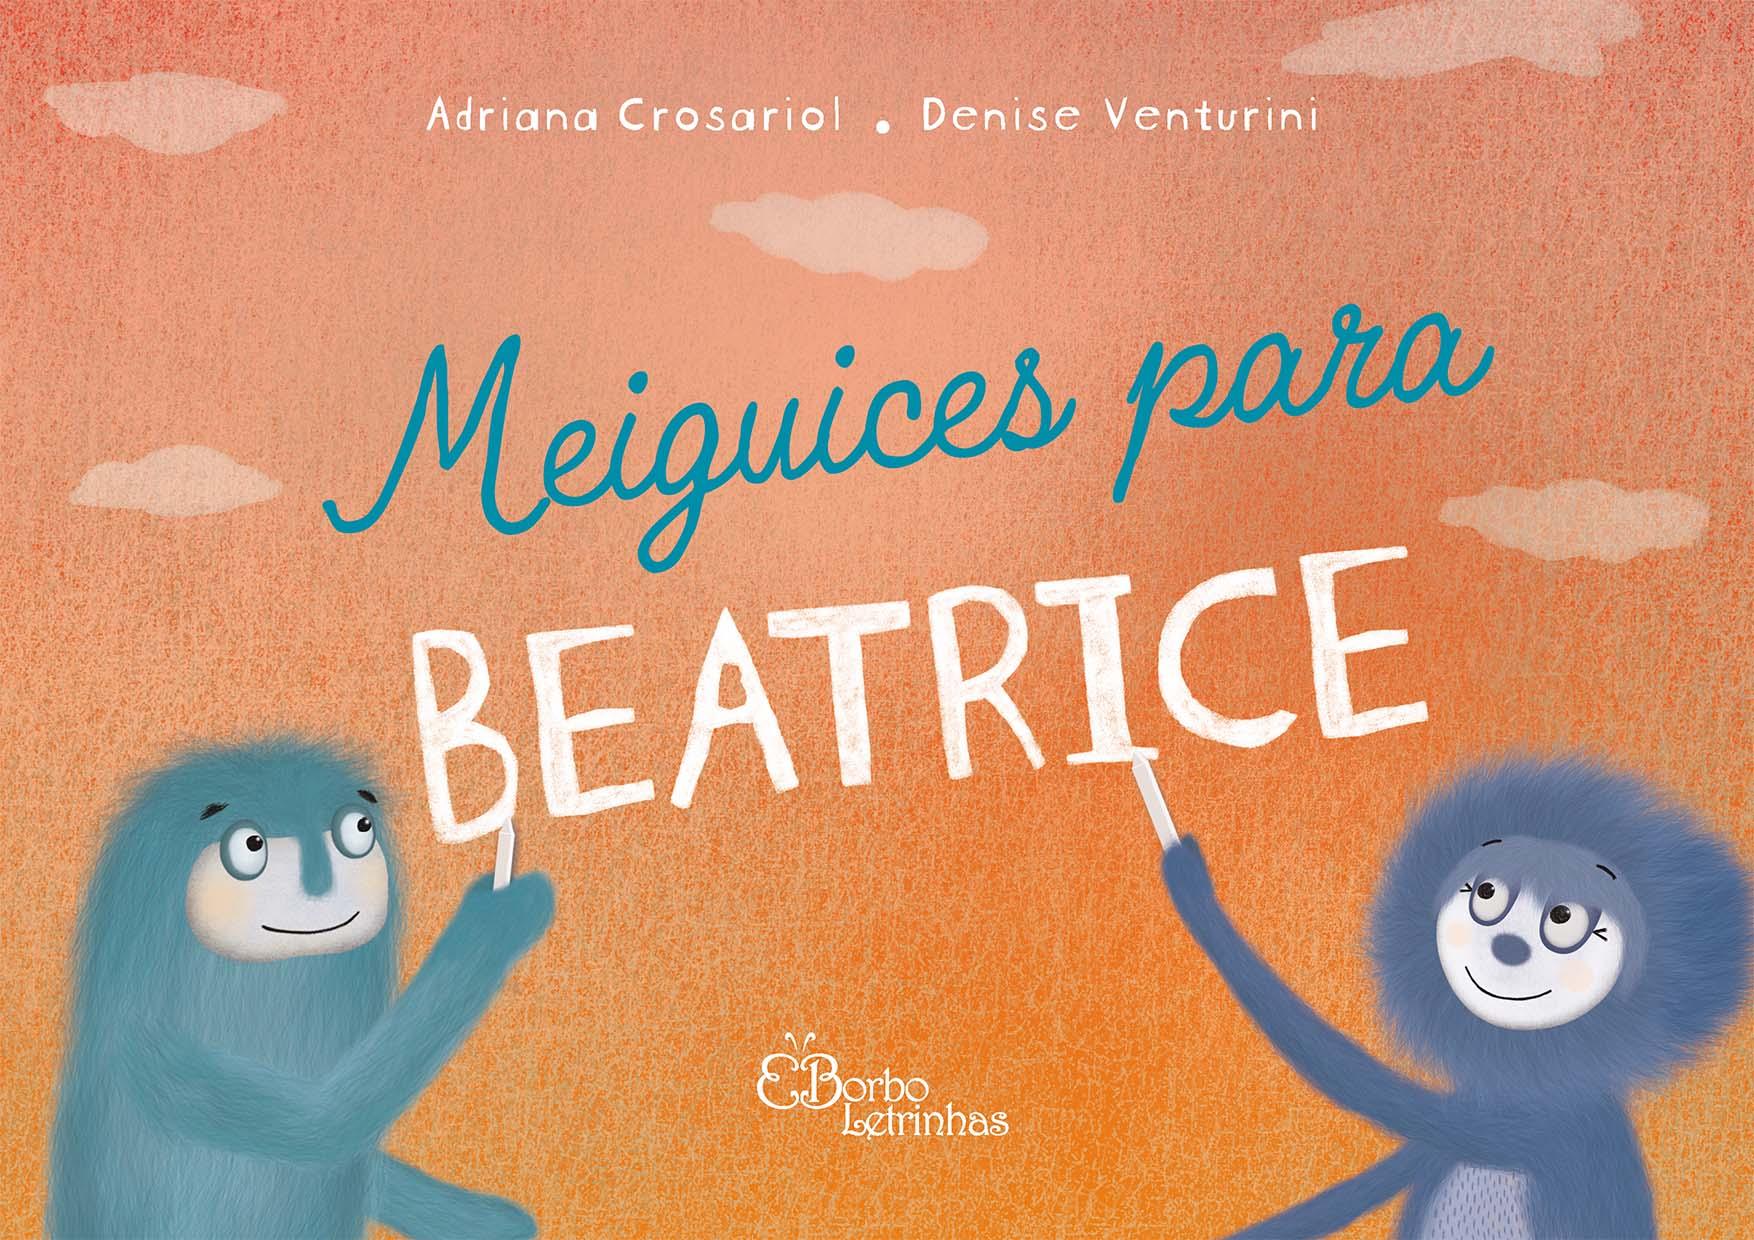 Meiguices para Beatrice